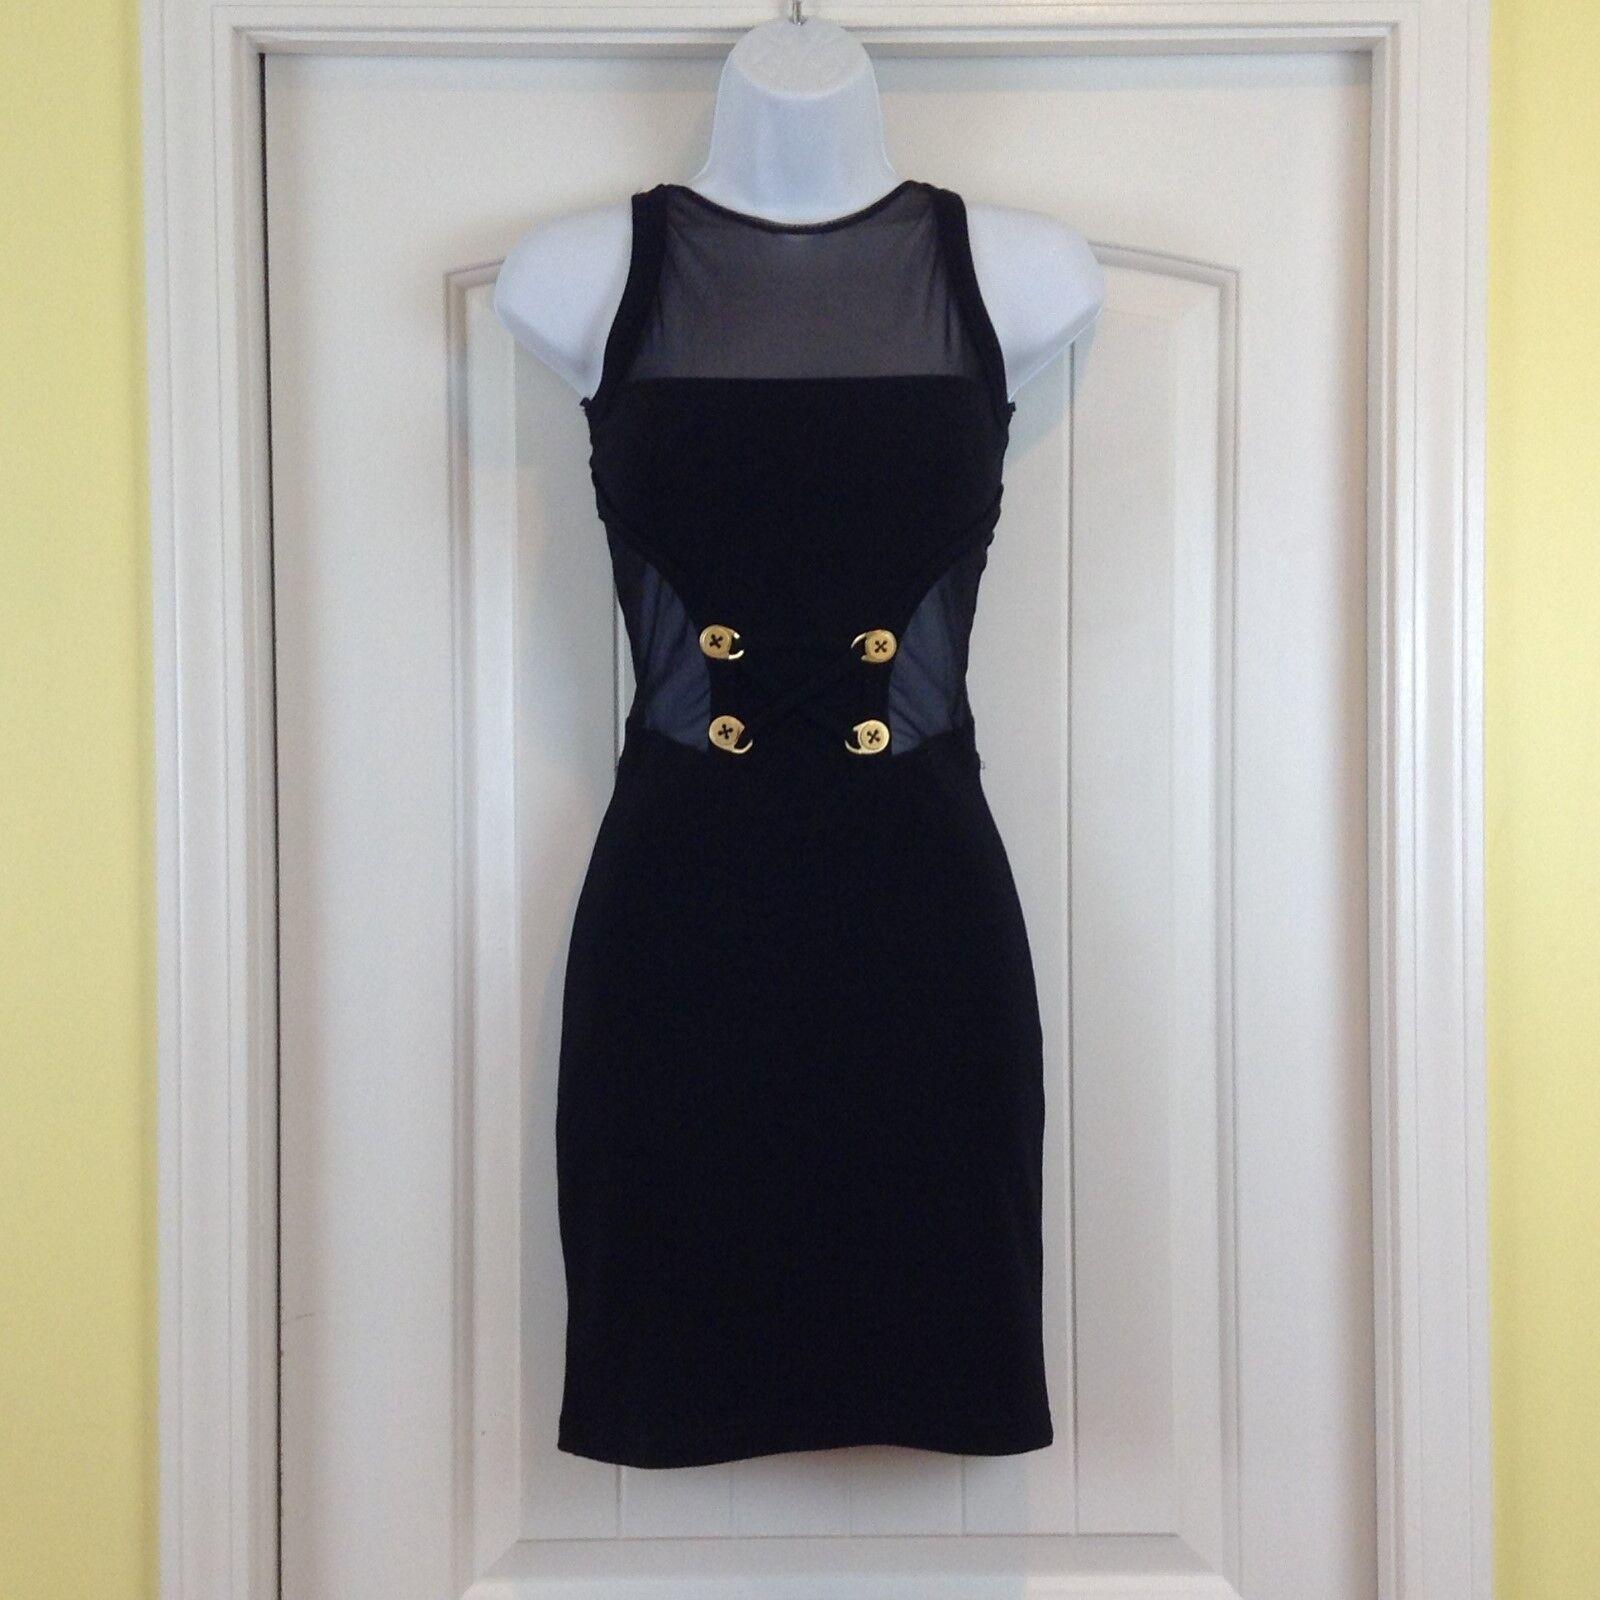 VTG 80's Andrea Isabella Größe Small schwarz Laced Back Mesh Stretch BodyCon Dress